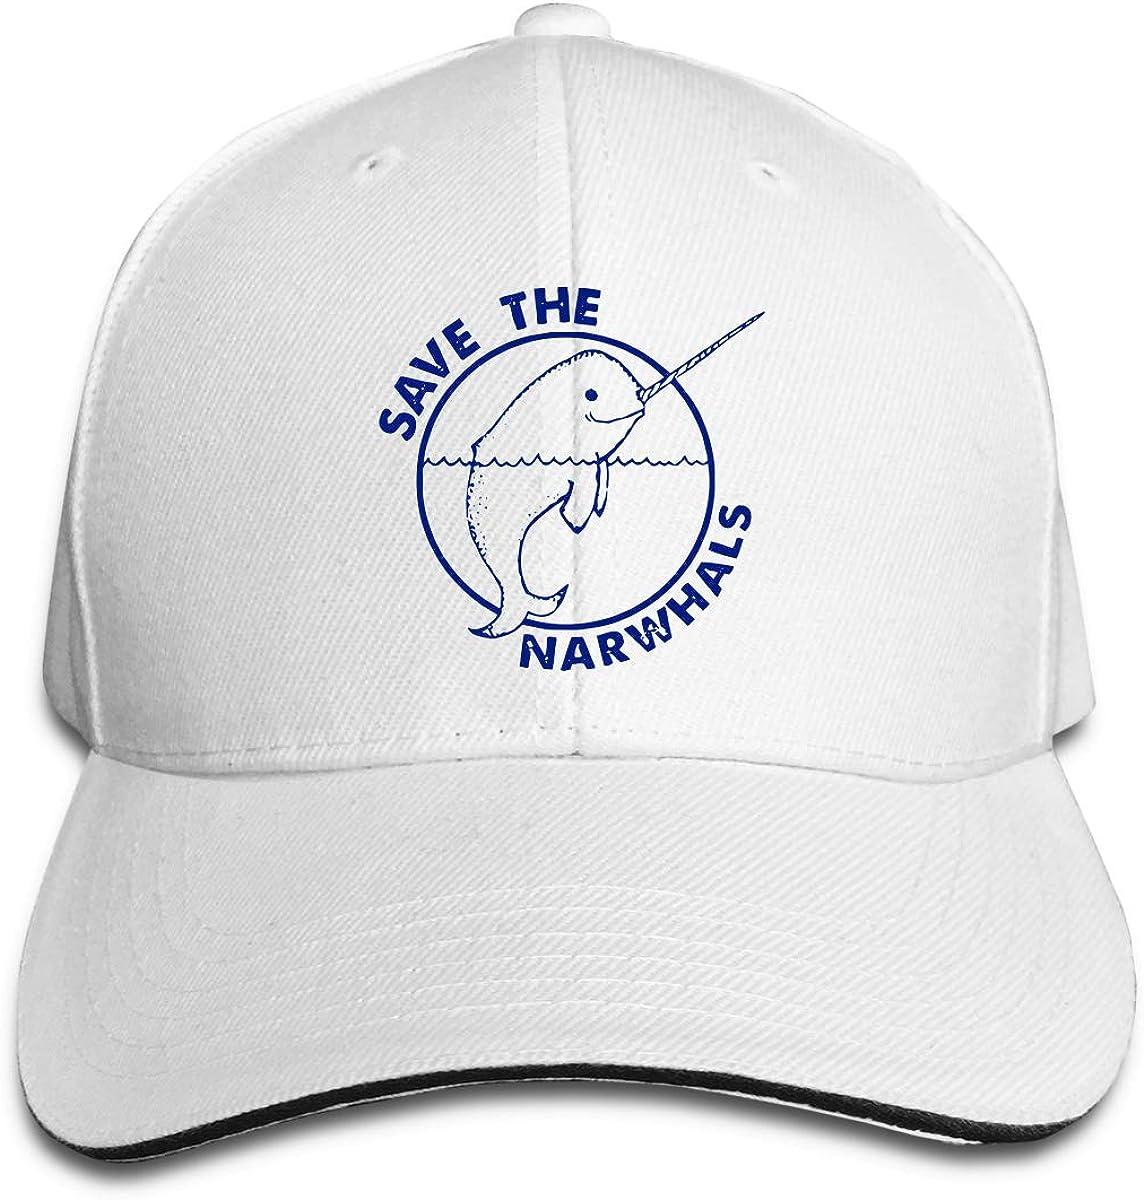 Save The Narwhals 1 Outdoor Snapback Sandwich Cap Adjustable Baseball Hat Plain Cap